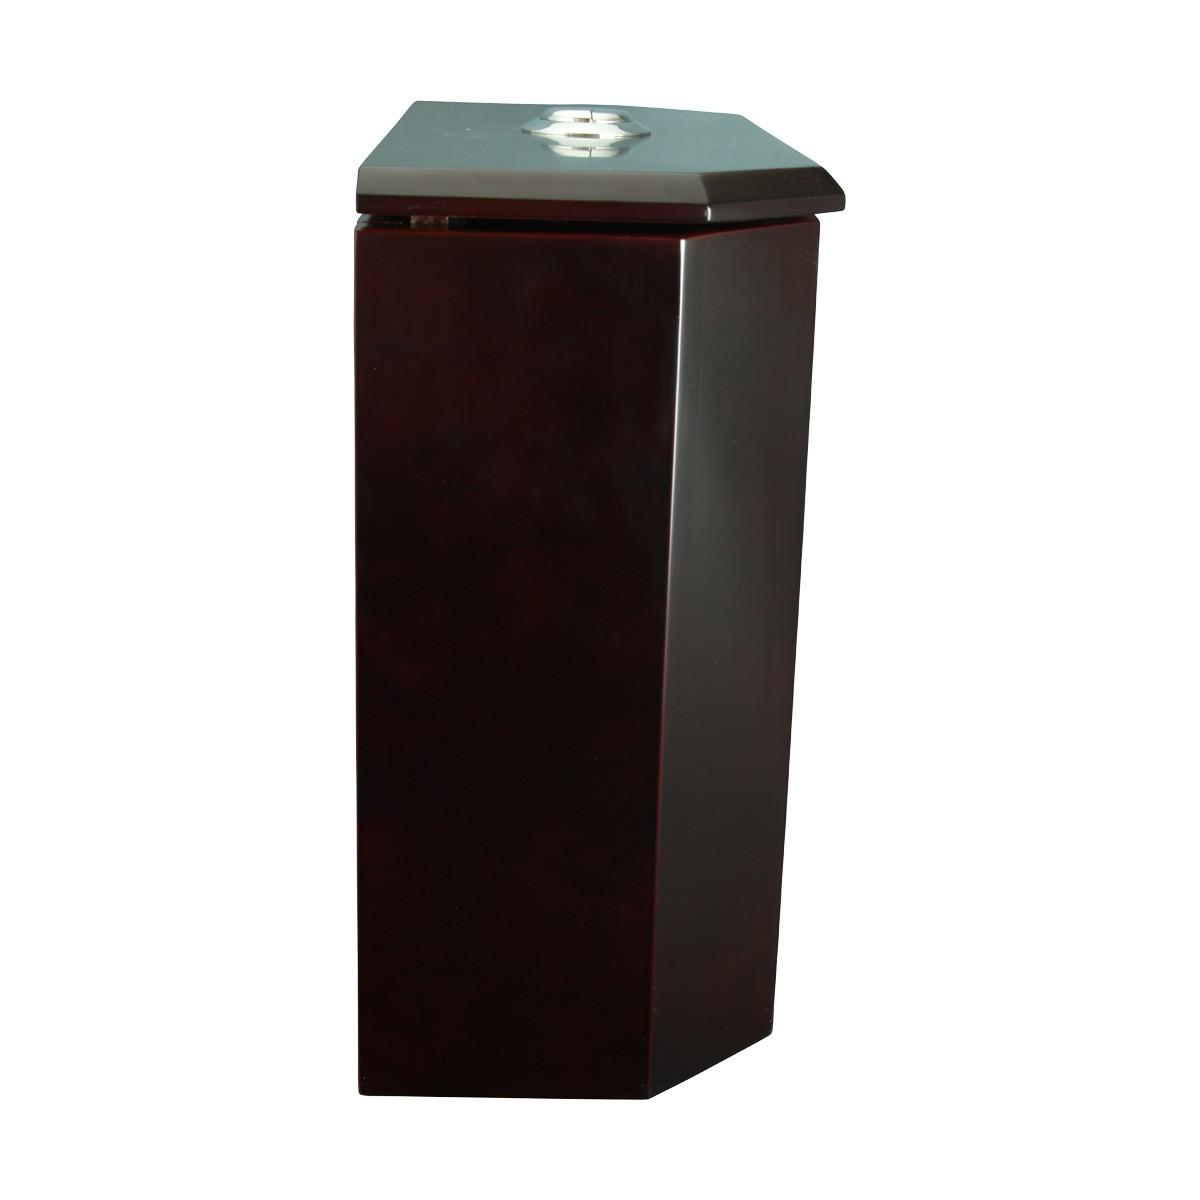 Toilet Part Cherry Finish Hardwood Lowboy Beveled Tank Only Toilet Part Toilet Parts Toilet Replacement Part